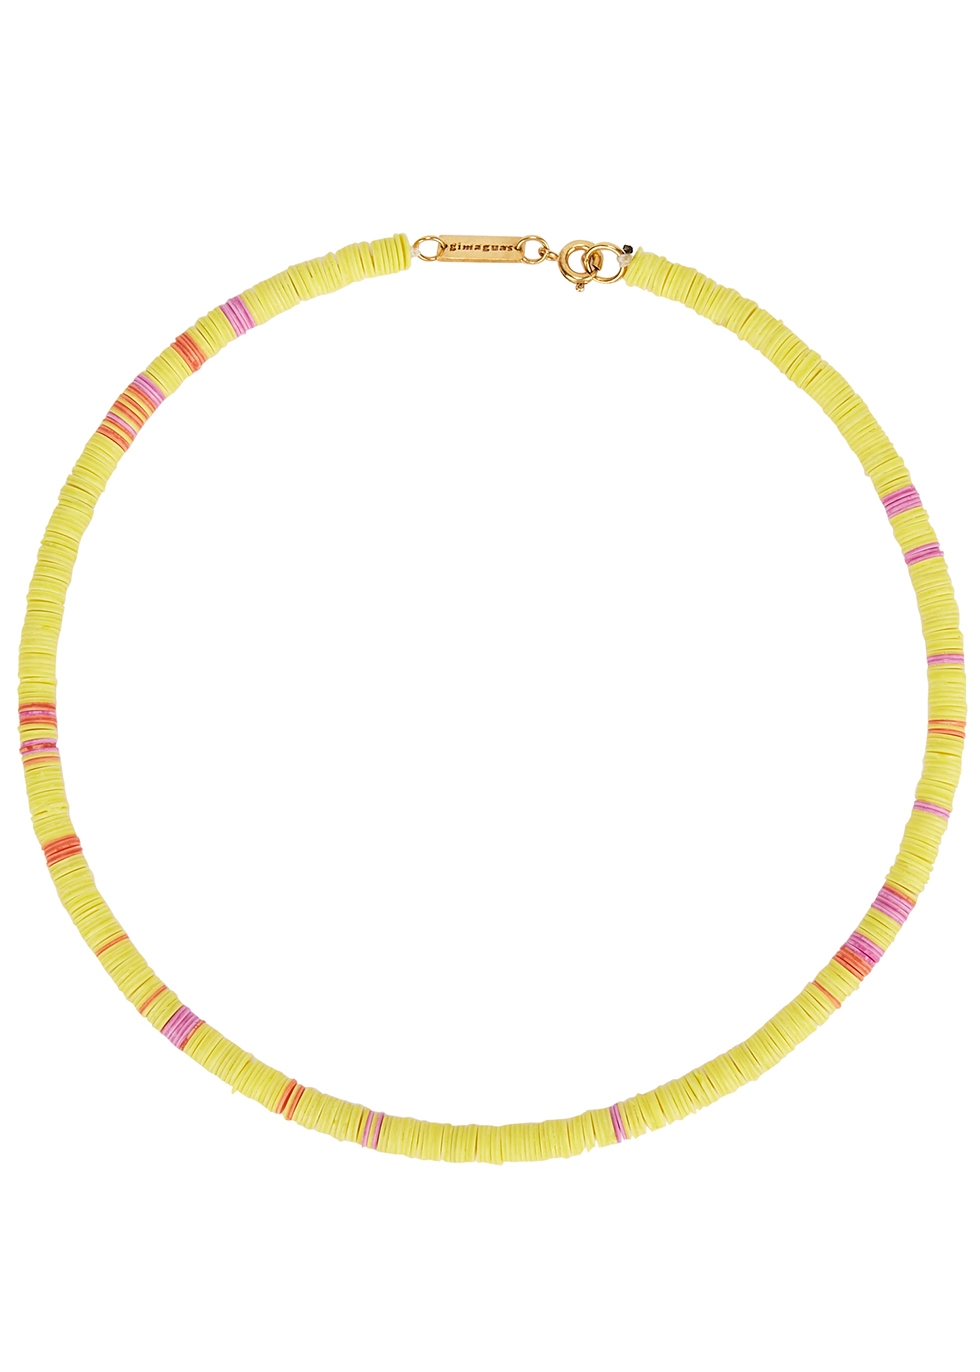 Pukas yellow beaded necklace